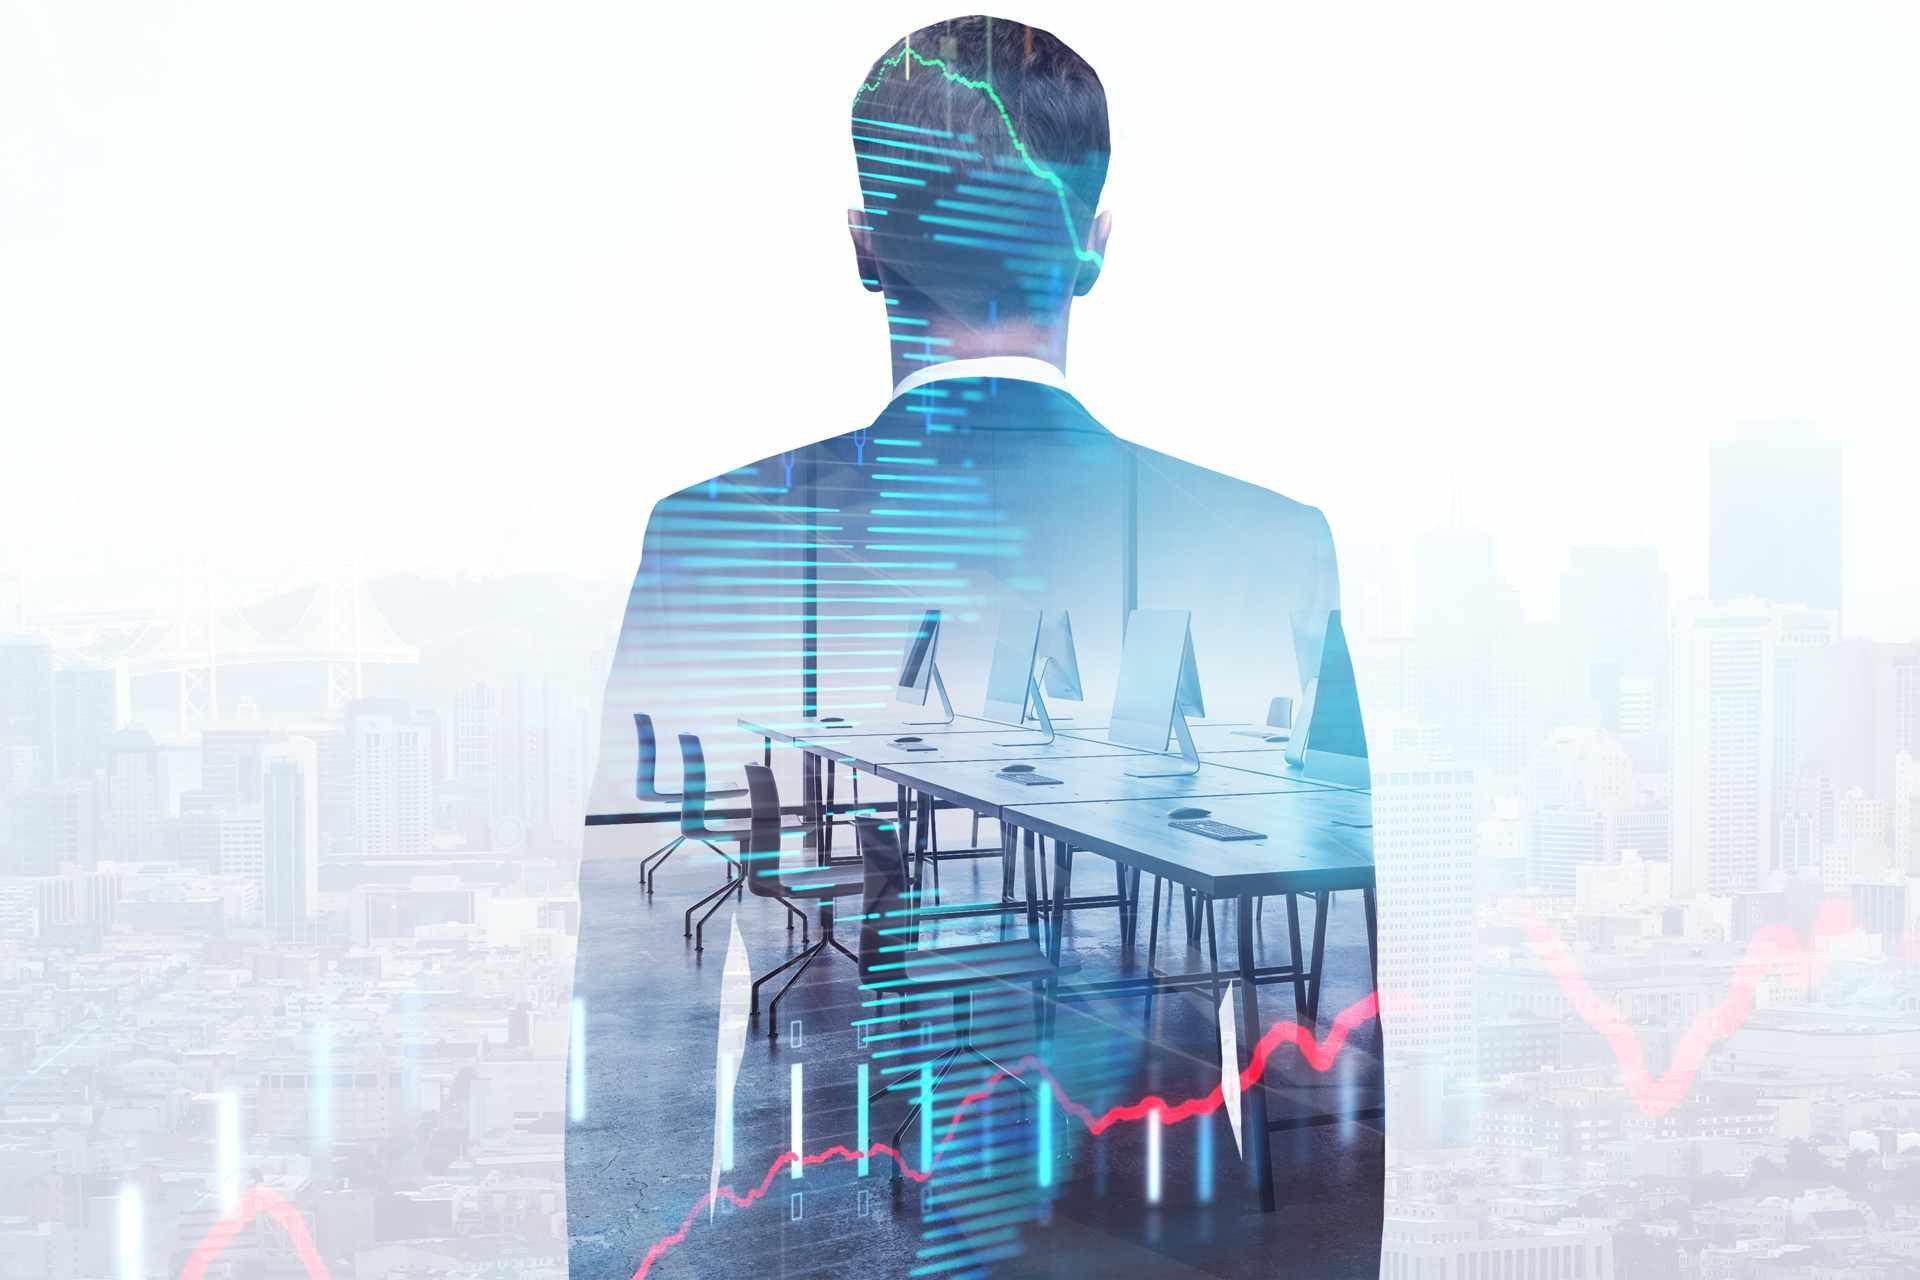 New Work - Digitale Transformation